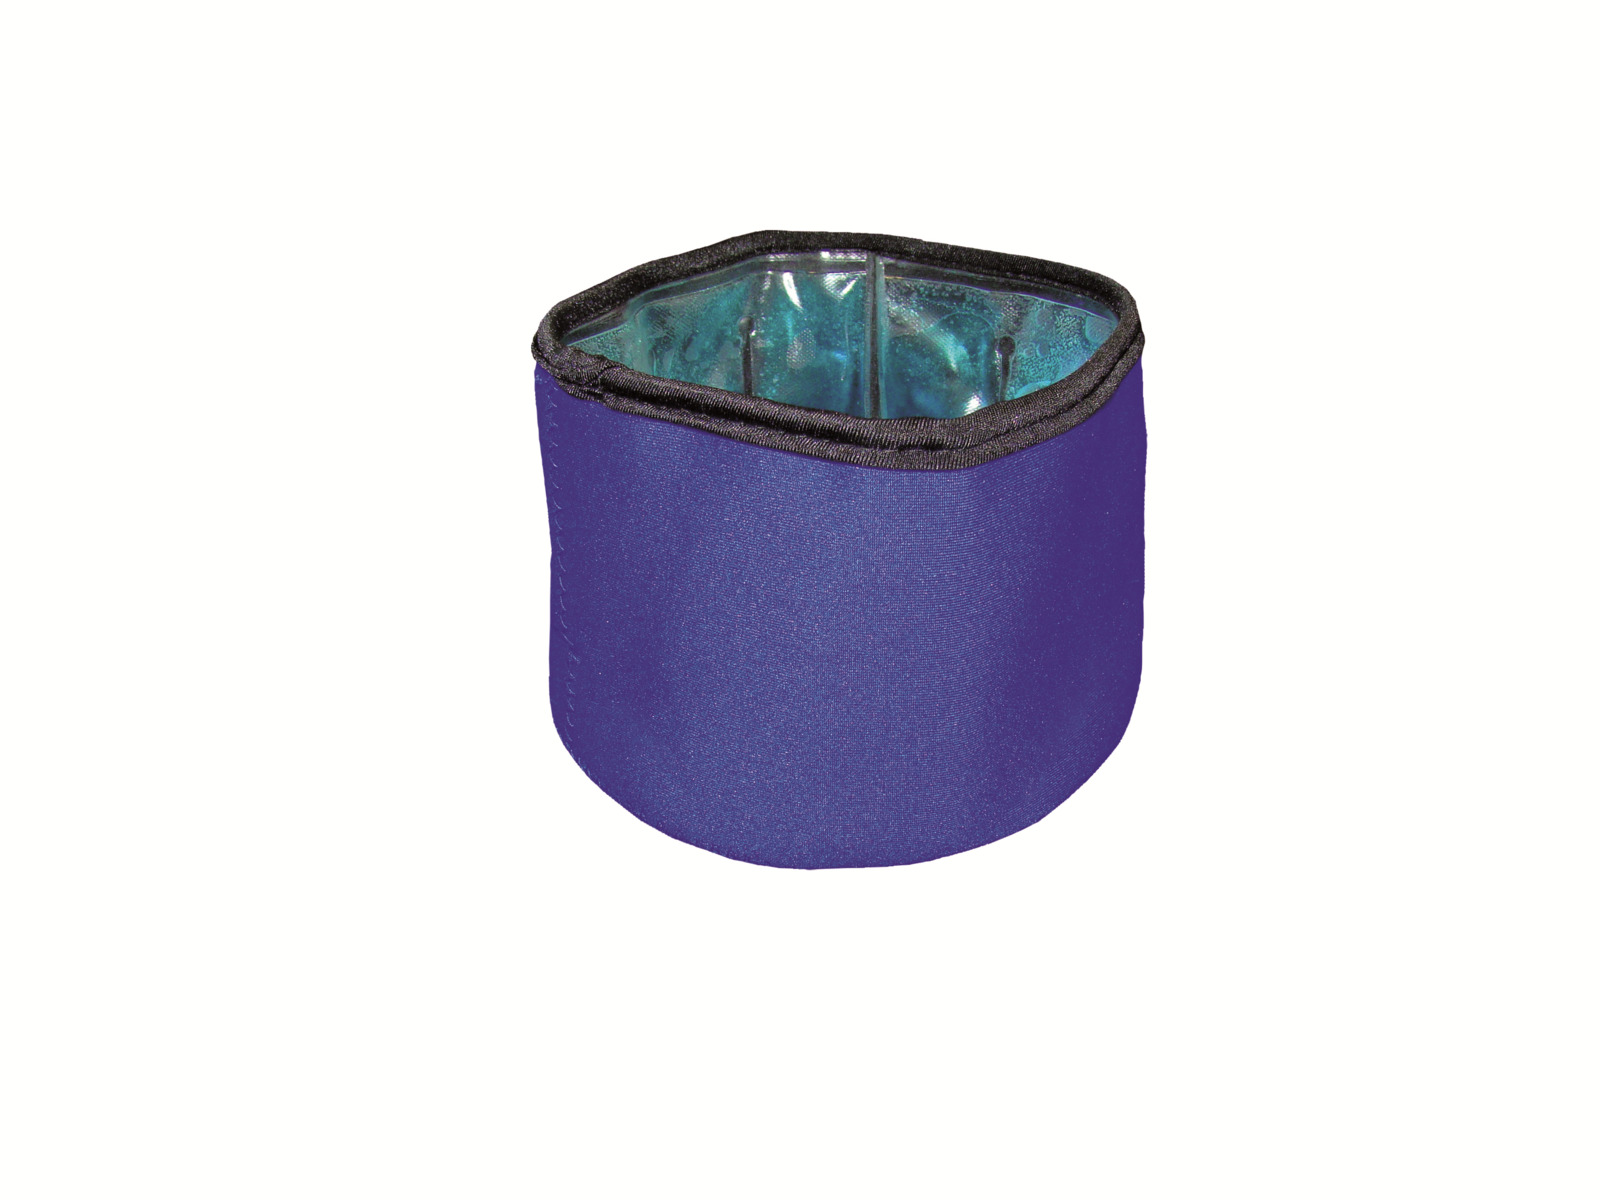 Миска для животных Nobby Fresh, охлаждающая, складная, 62215, синий, 300 мл